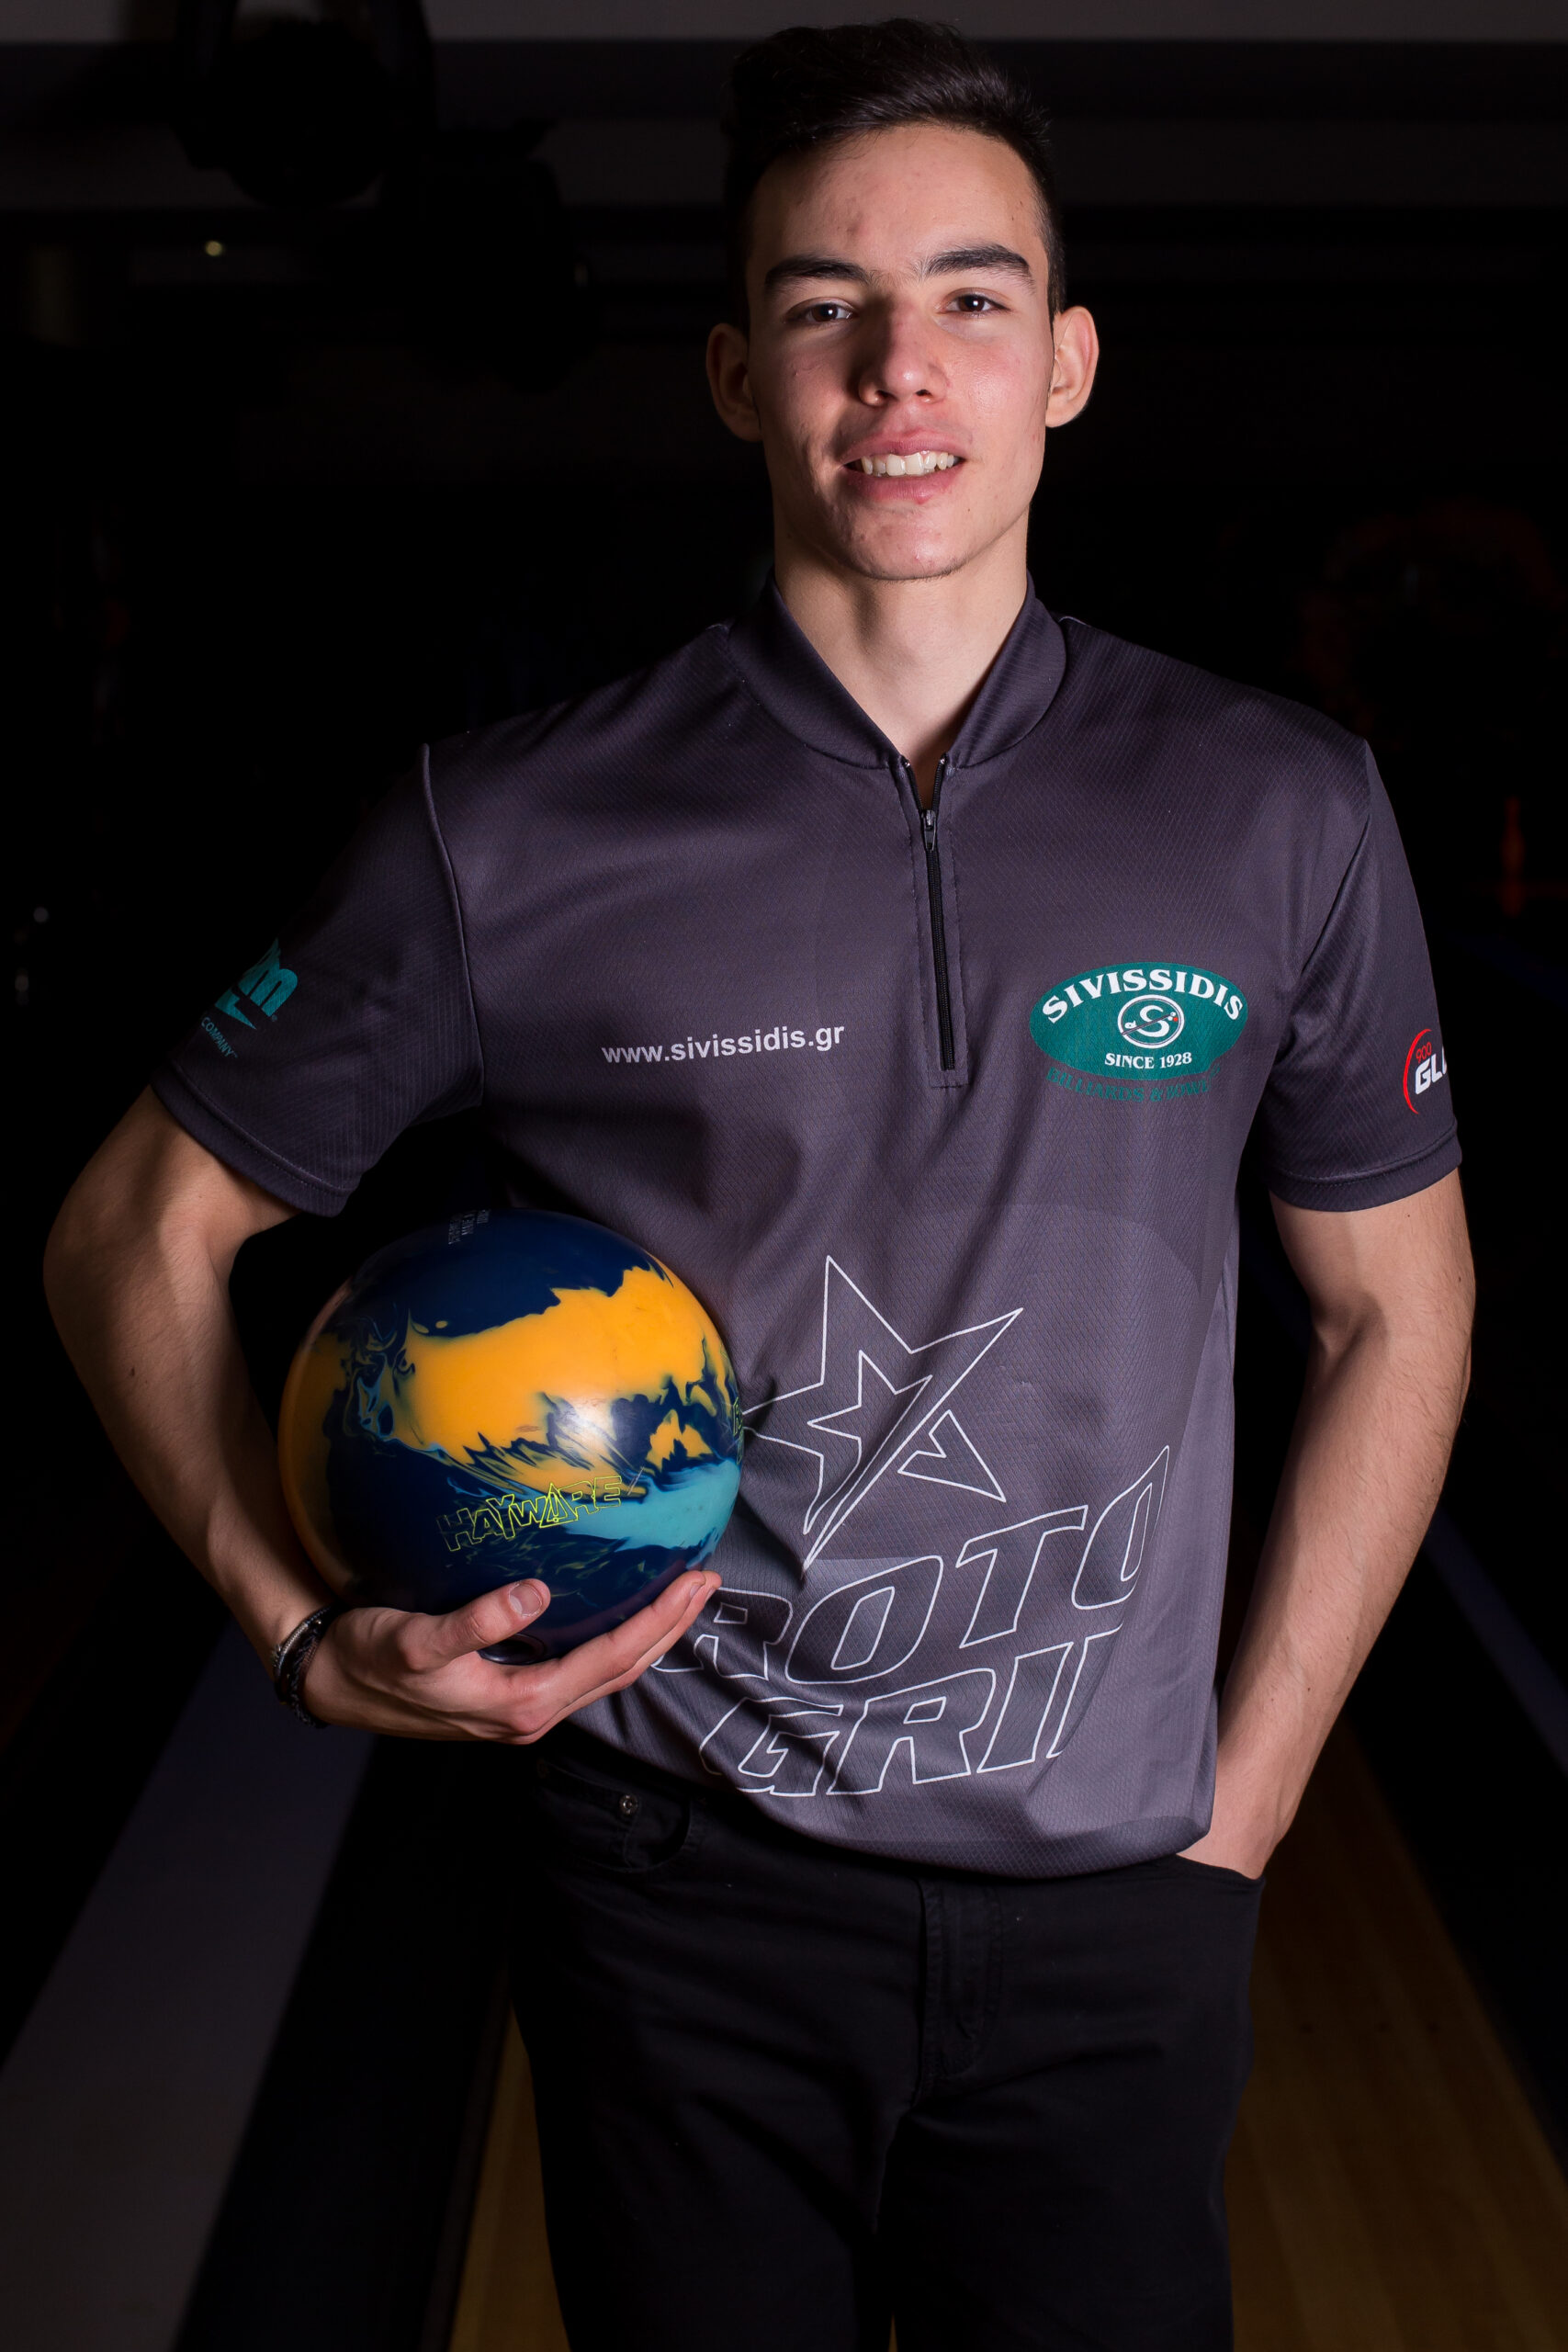 pikoulis ioannis Select Team bowling - Αφοί Σιβισίδη / Sivissidis Bros